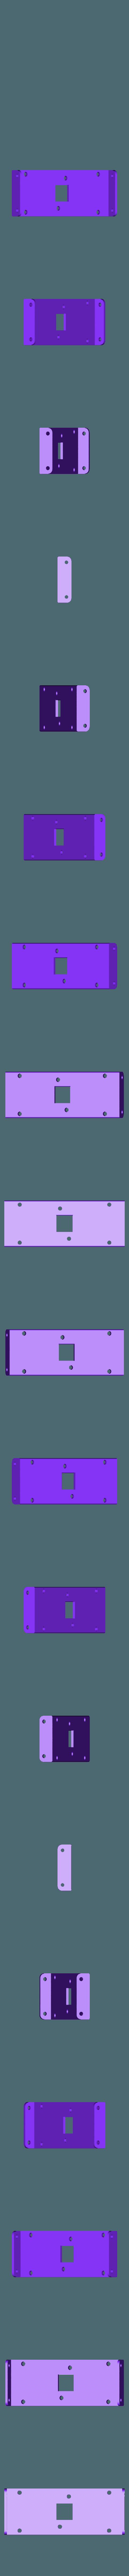 DFR_top.stl Download free STL file DFRobot Turtle Robot • 3D printable object, MakersBox